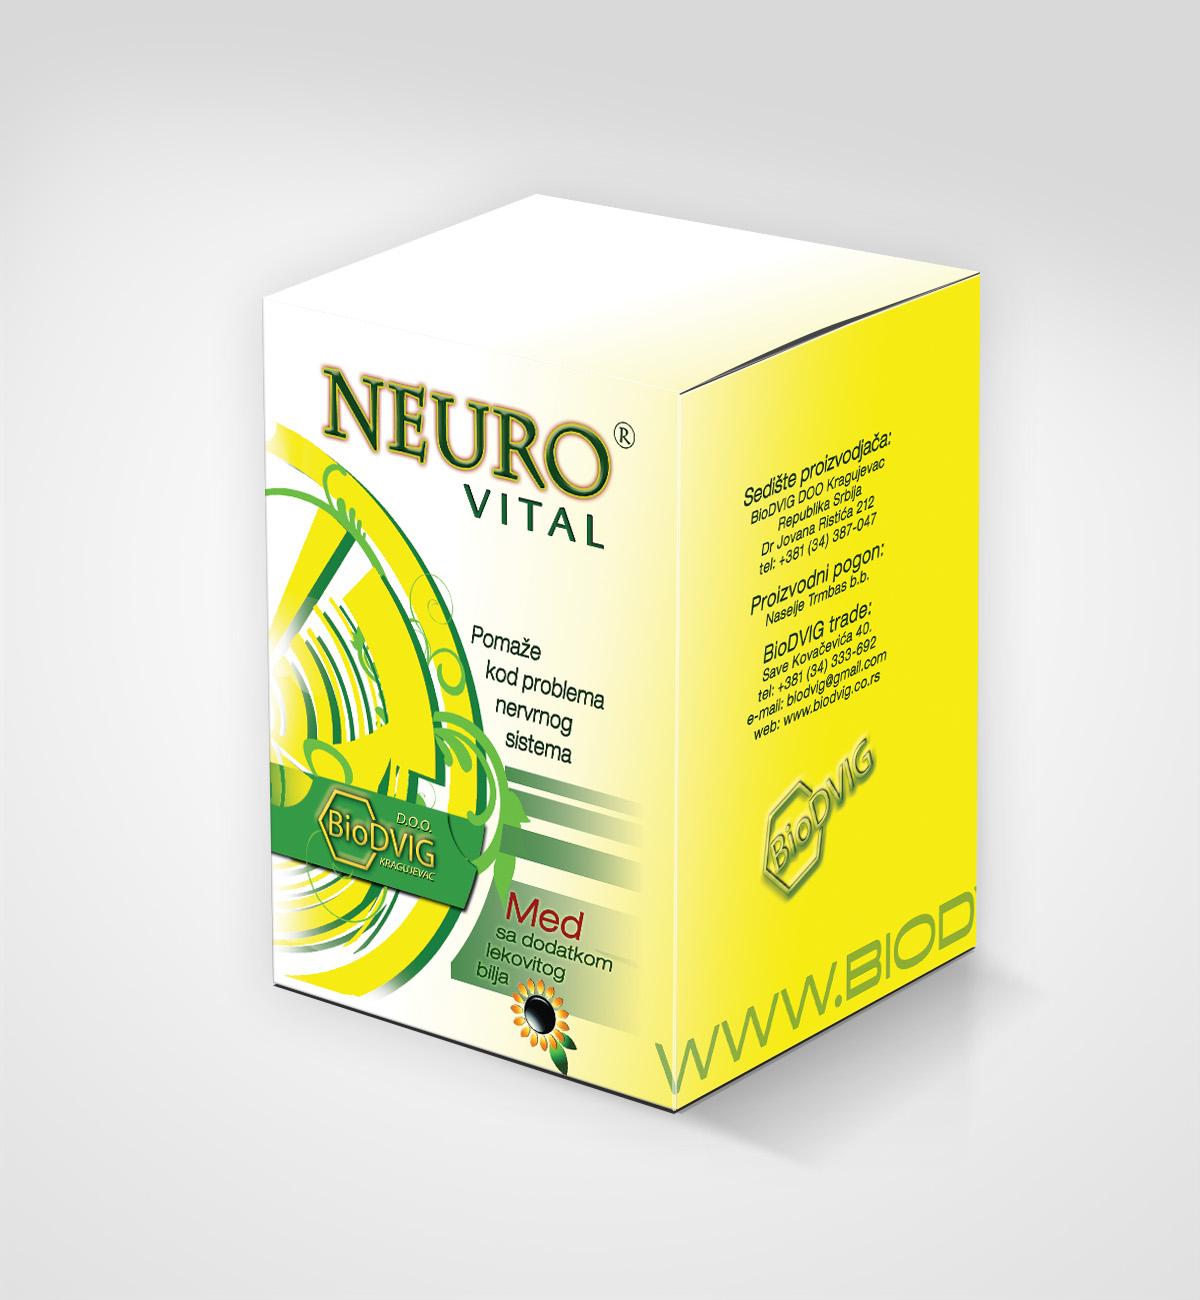 Neuro Vital - Biodvig DOO